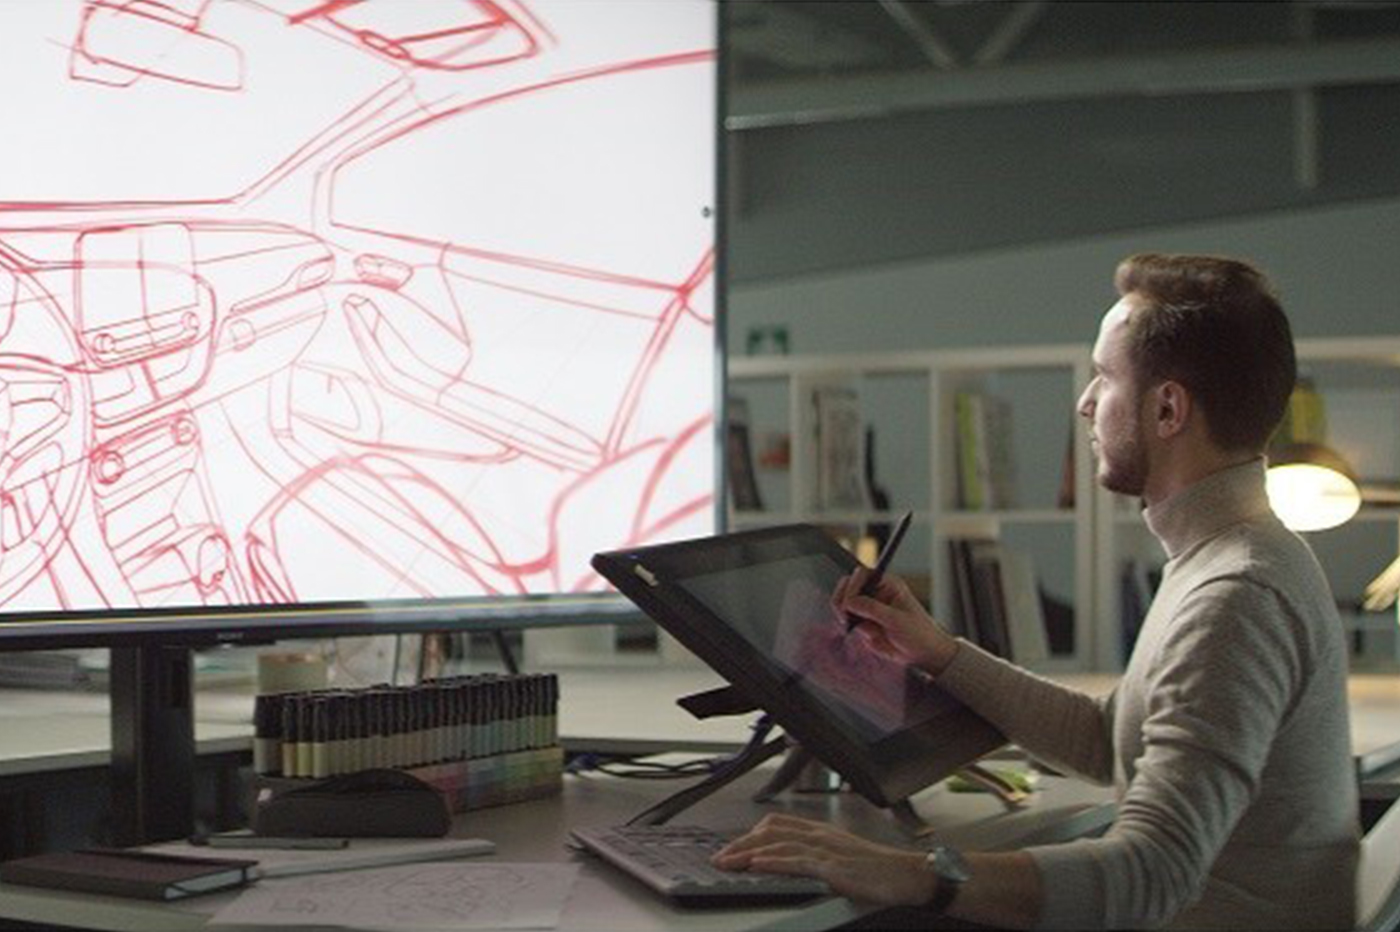 Ford design jeu vidéo